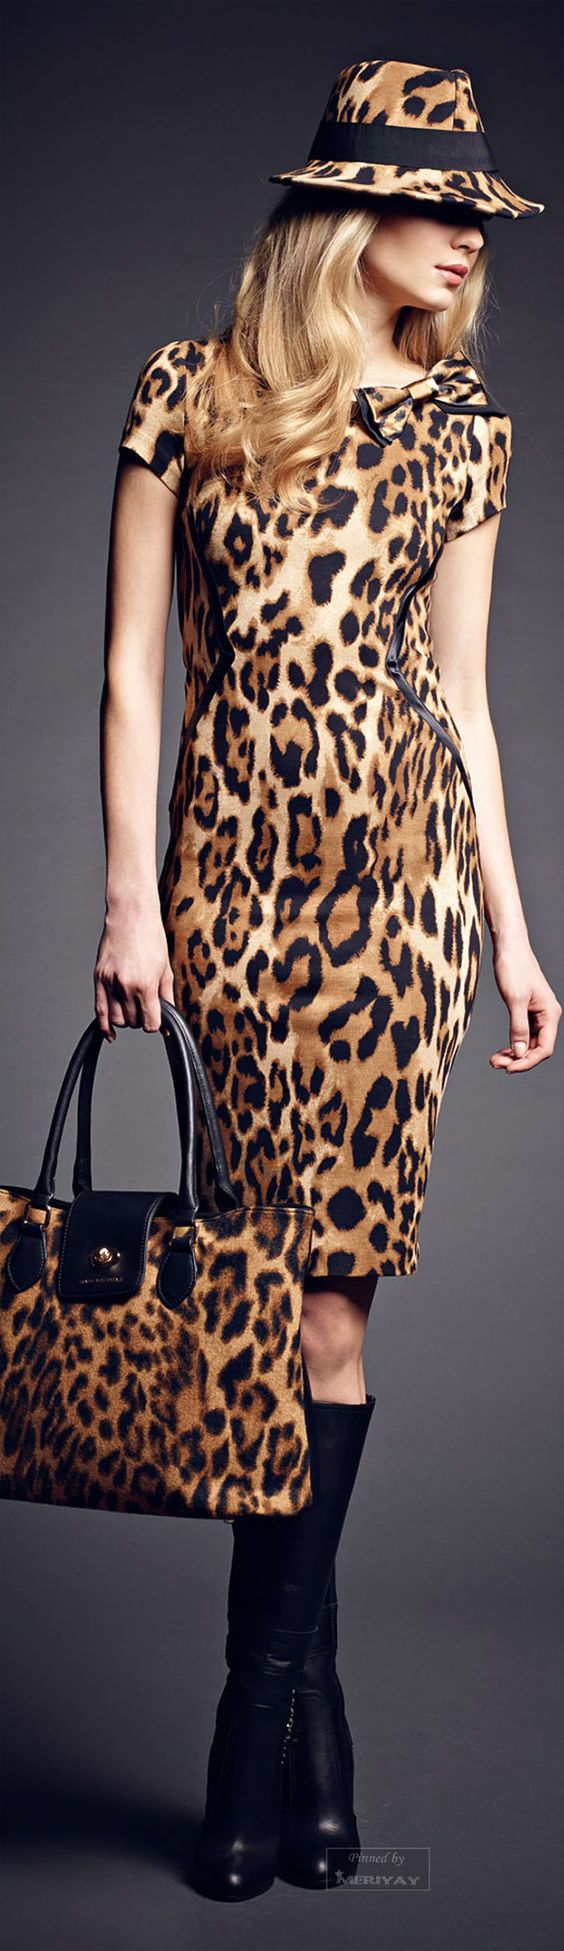 vestidos-animal-print-3